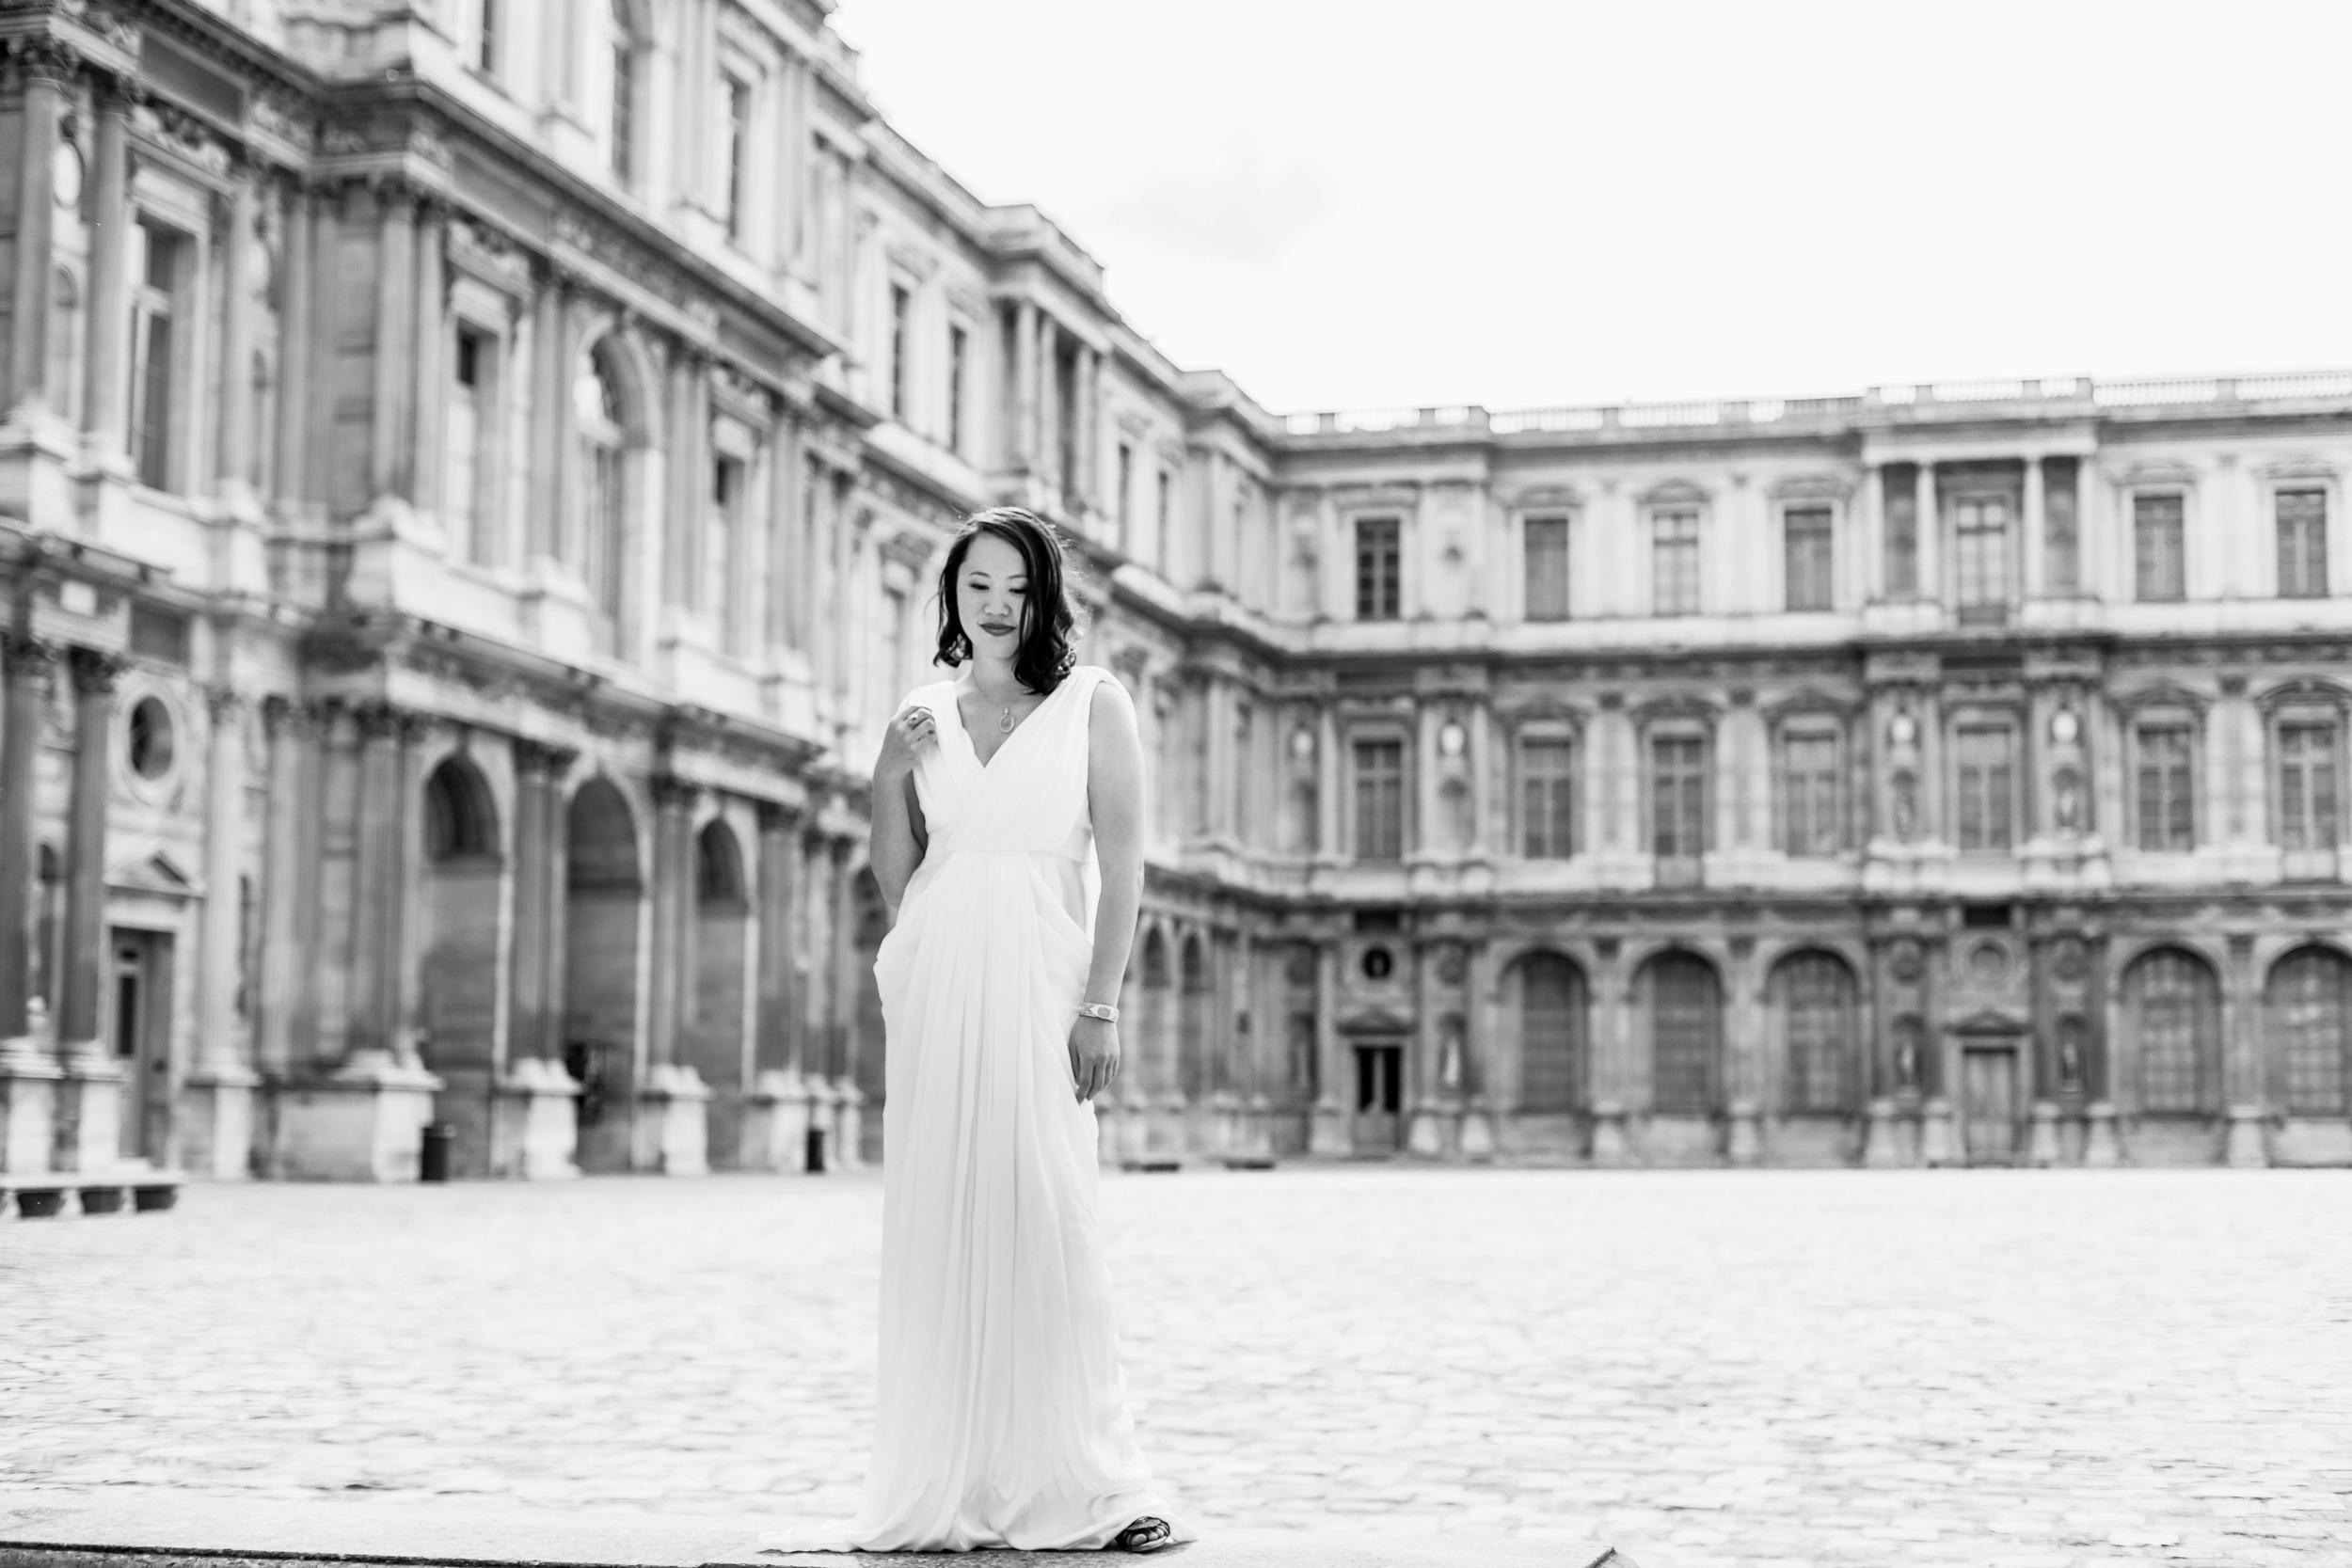 Paris Photographer, The Louvre, Birthday, portrait session, individual, IheartParisfr